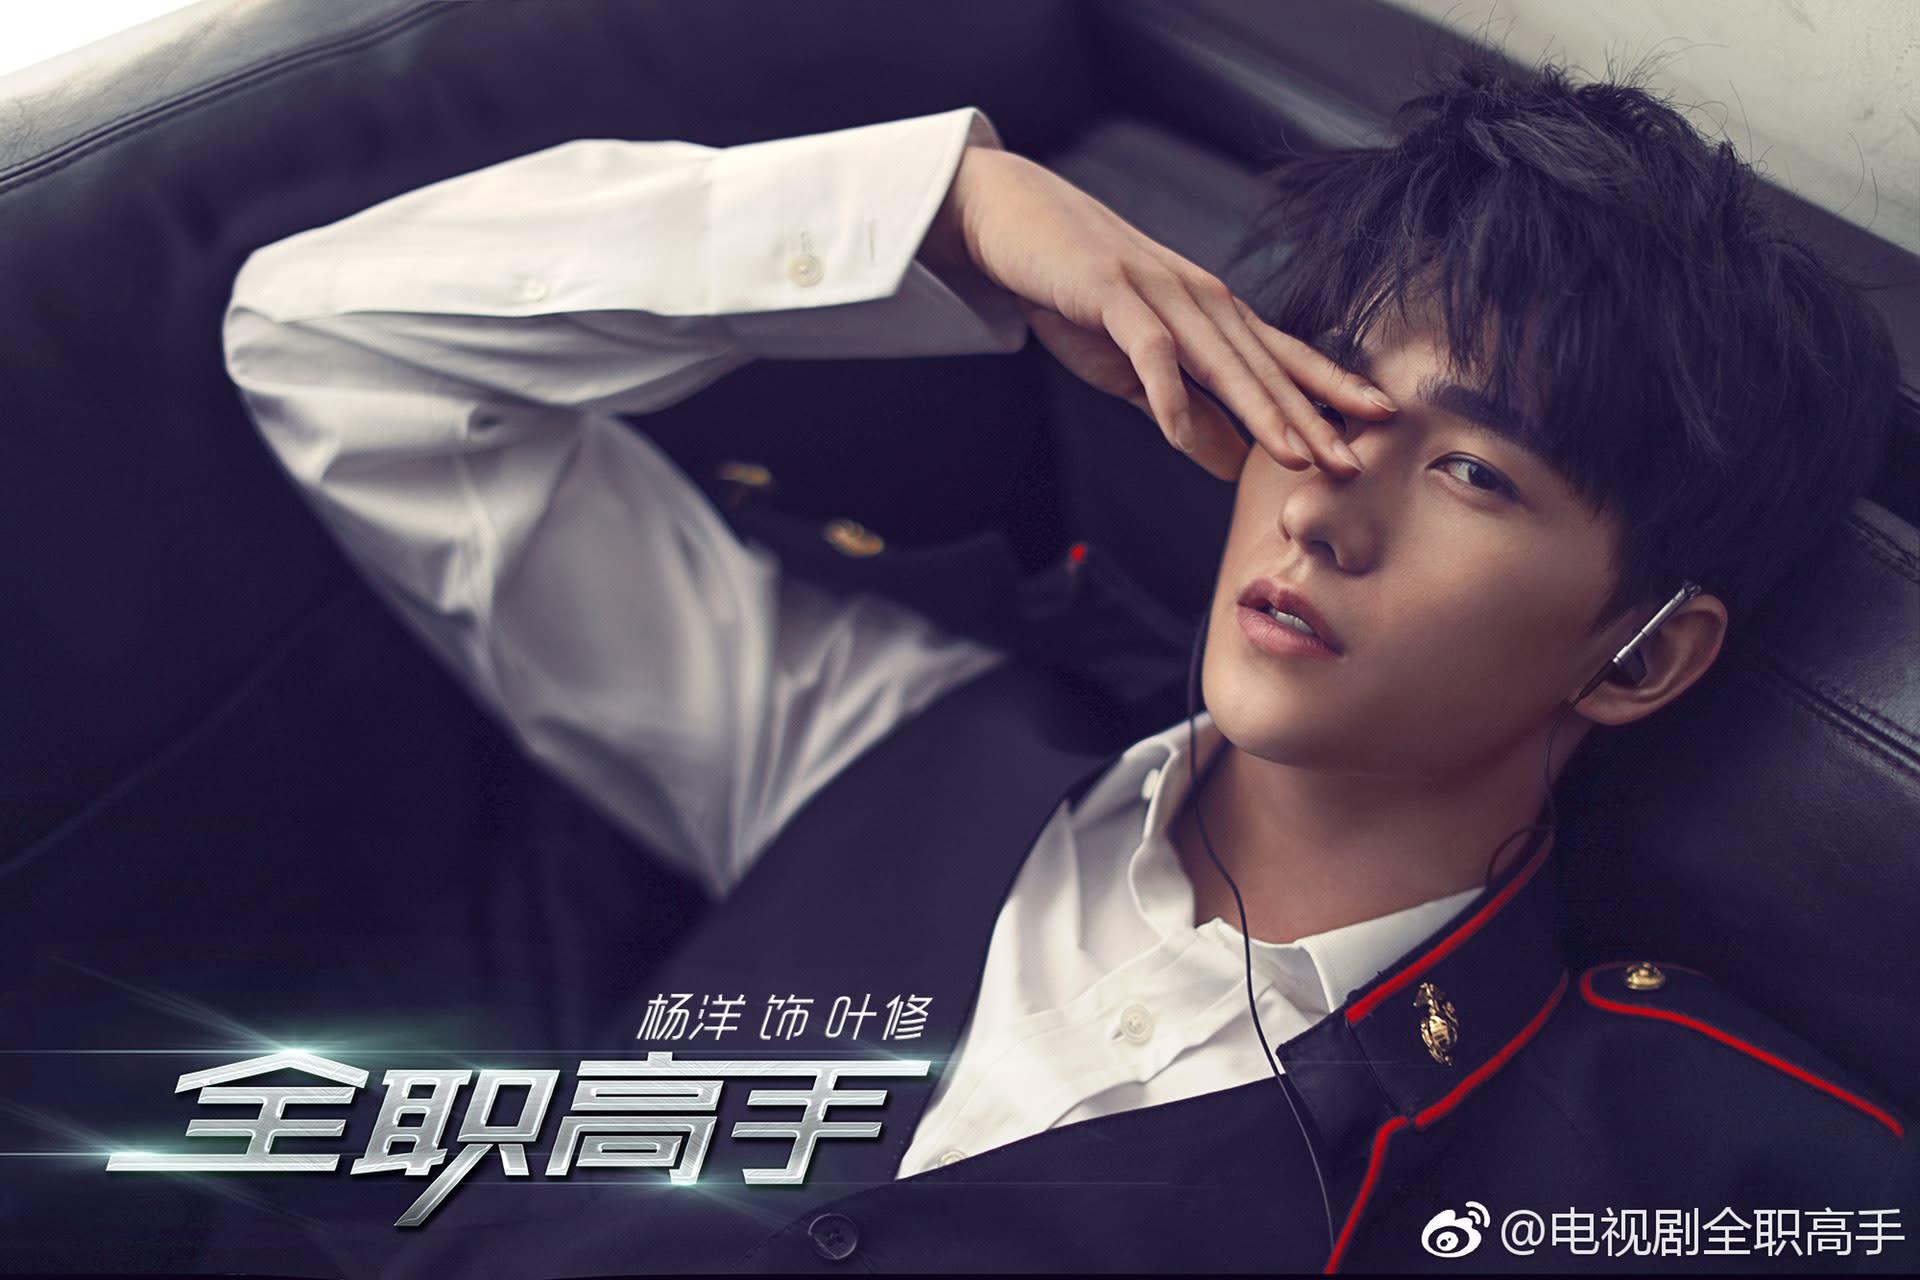 (Credit:電視劇全職高手 Weibo)